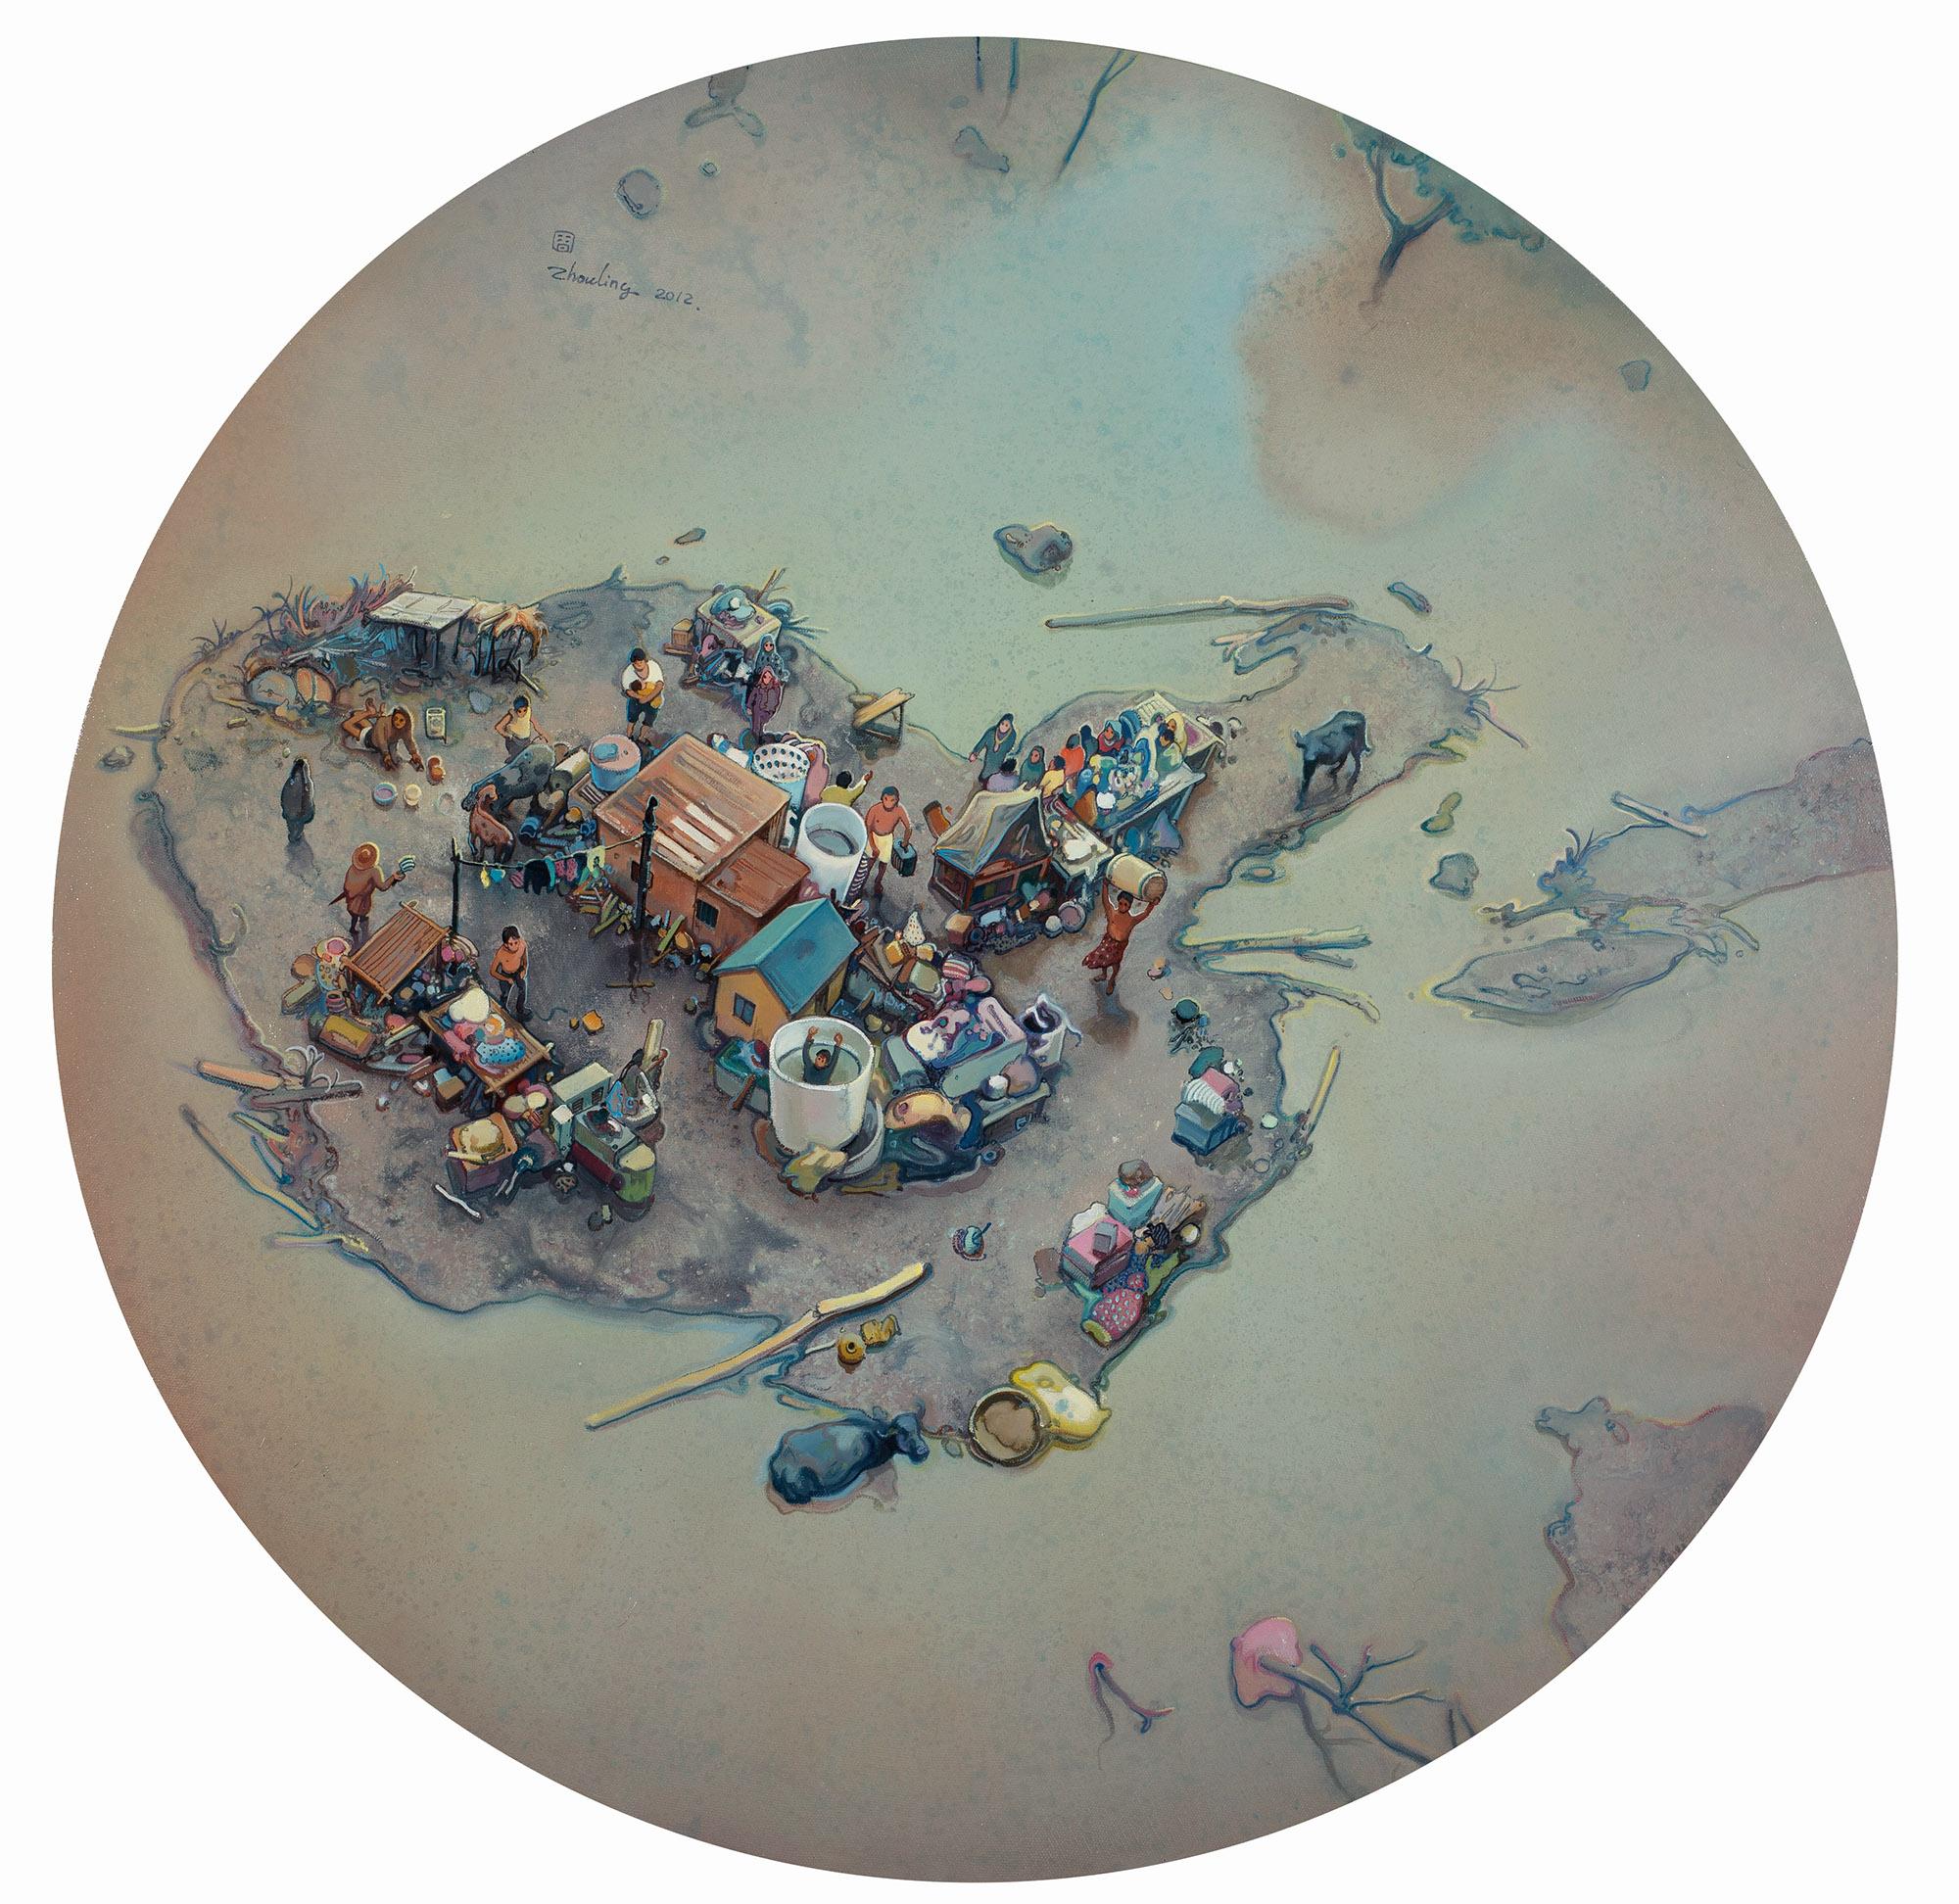 Zhou Jinhua 周金华, Landscaping Life No.1 景观生活 No.1, 2012, Oil on canvas 布面油画, Dia 100 cm